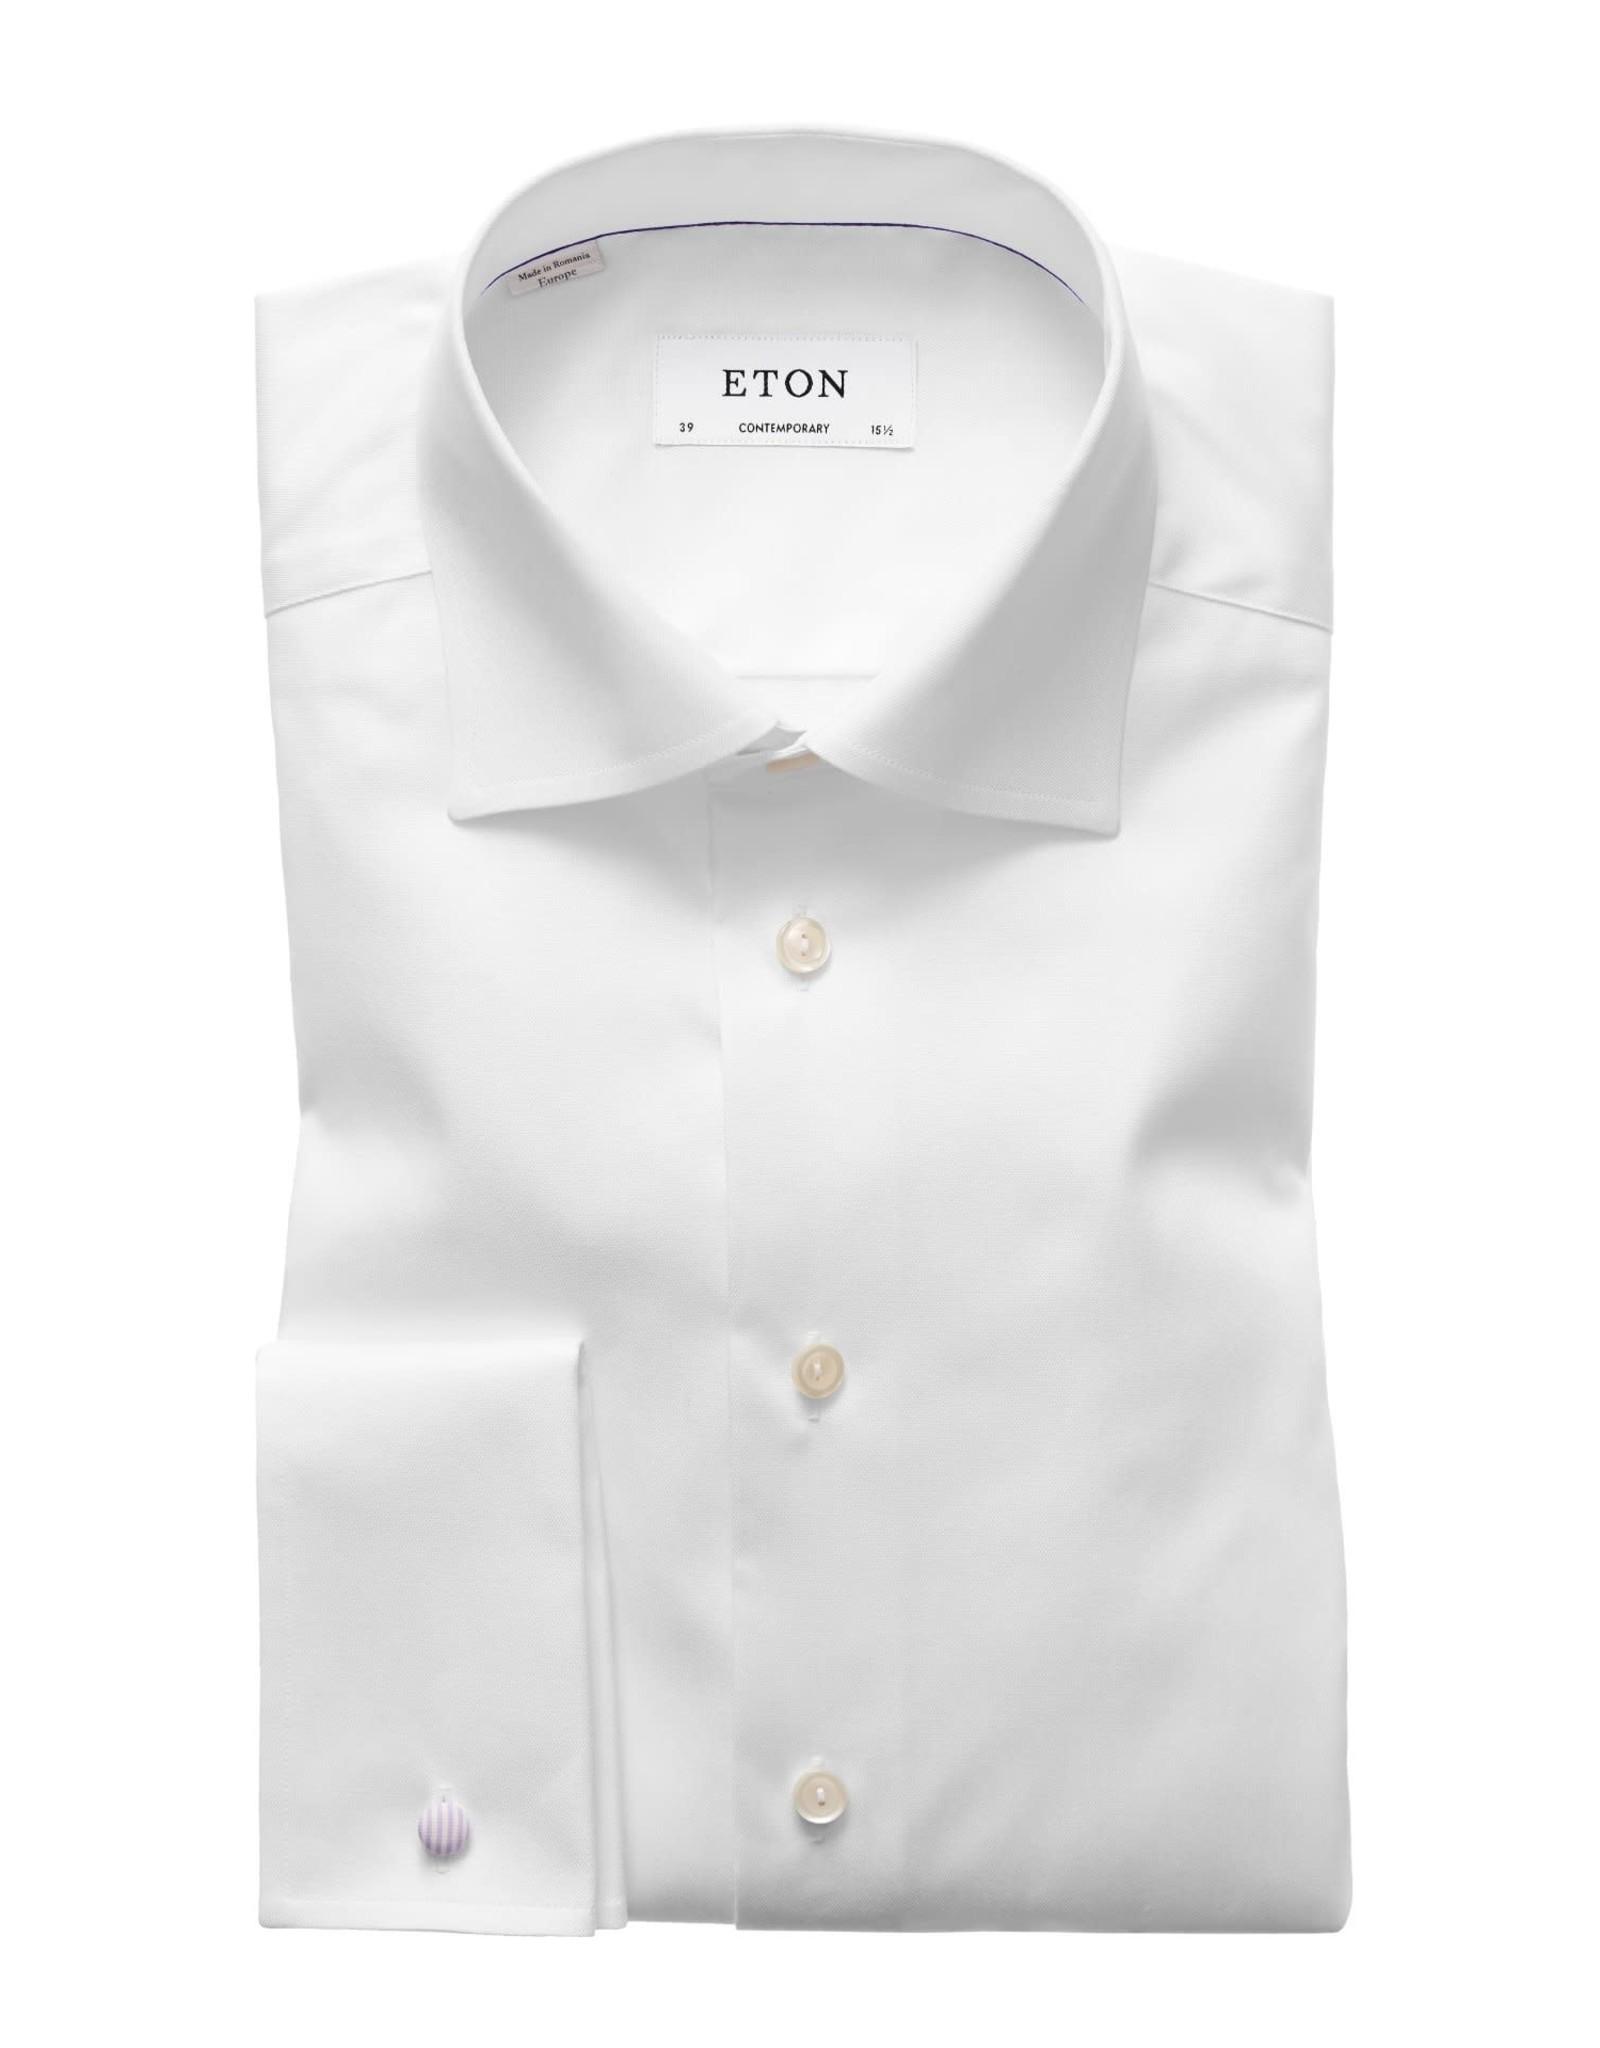 Eton Eton hemd wit dubbel manchet contemporary 3000-79312/00